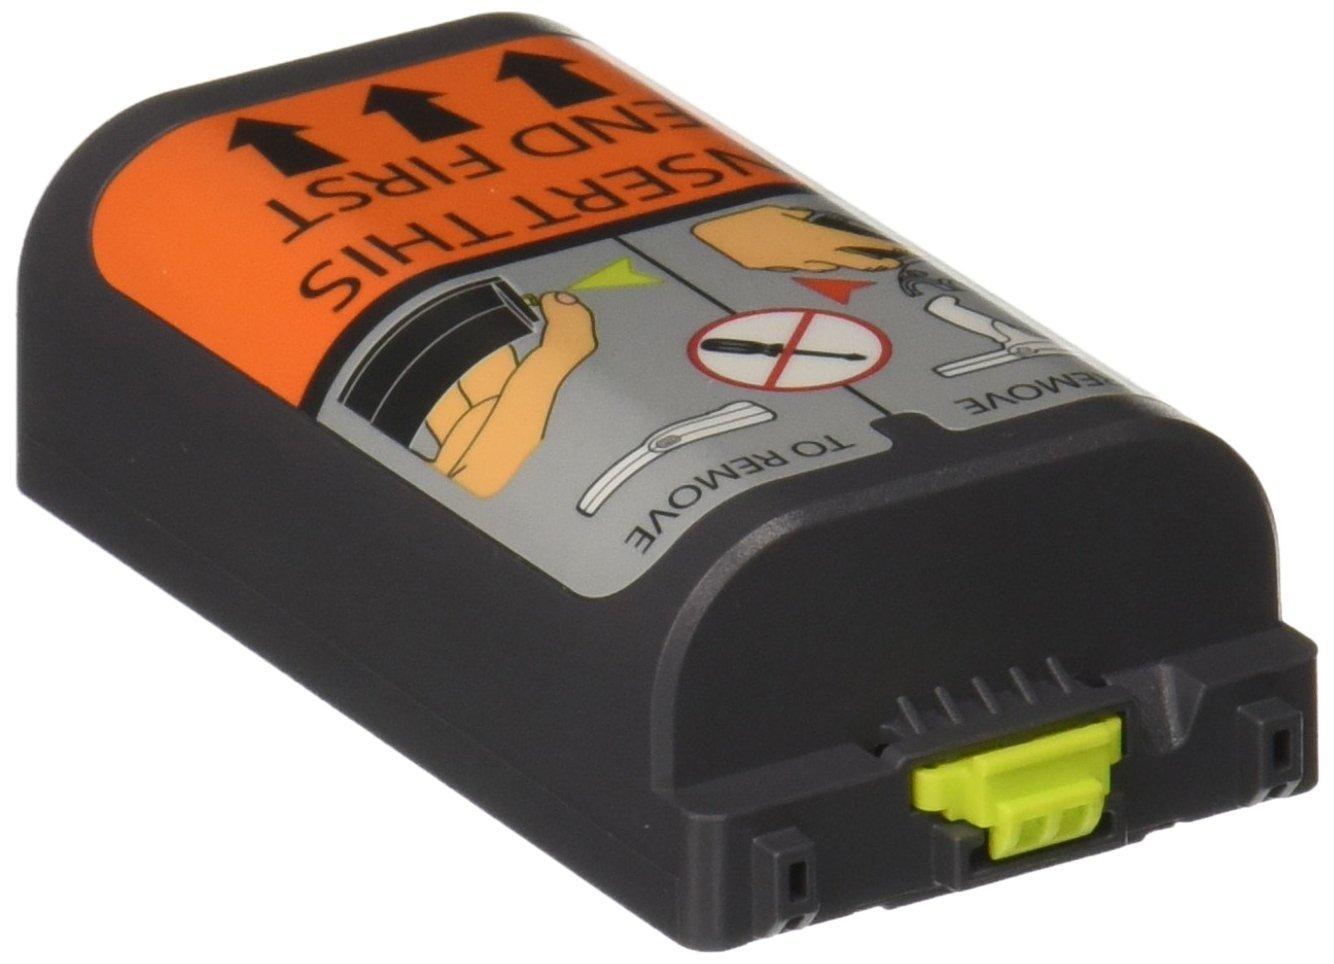 Motorola BTRY-MC31KAB02-10 High-Capacity Spare Lithium Ion Battery for Motorola MC31 Series Mobile Computer, 4800 mAh- Pack of 10